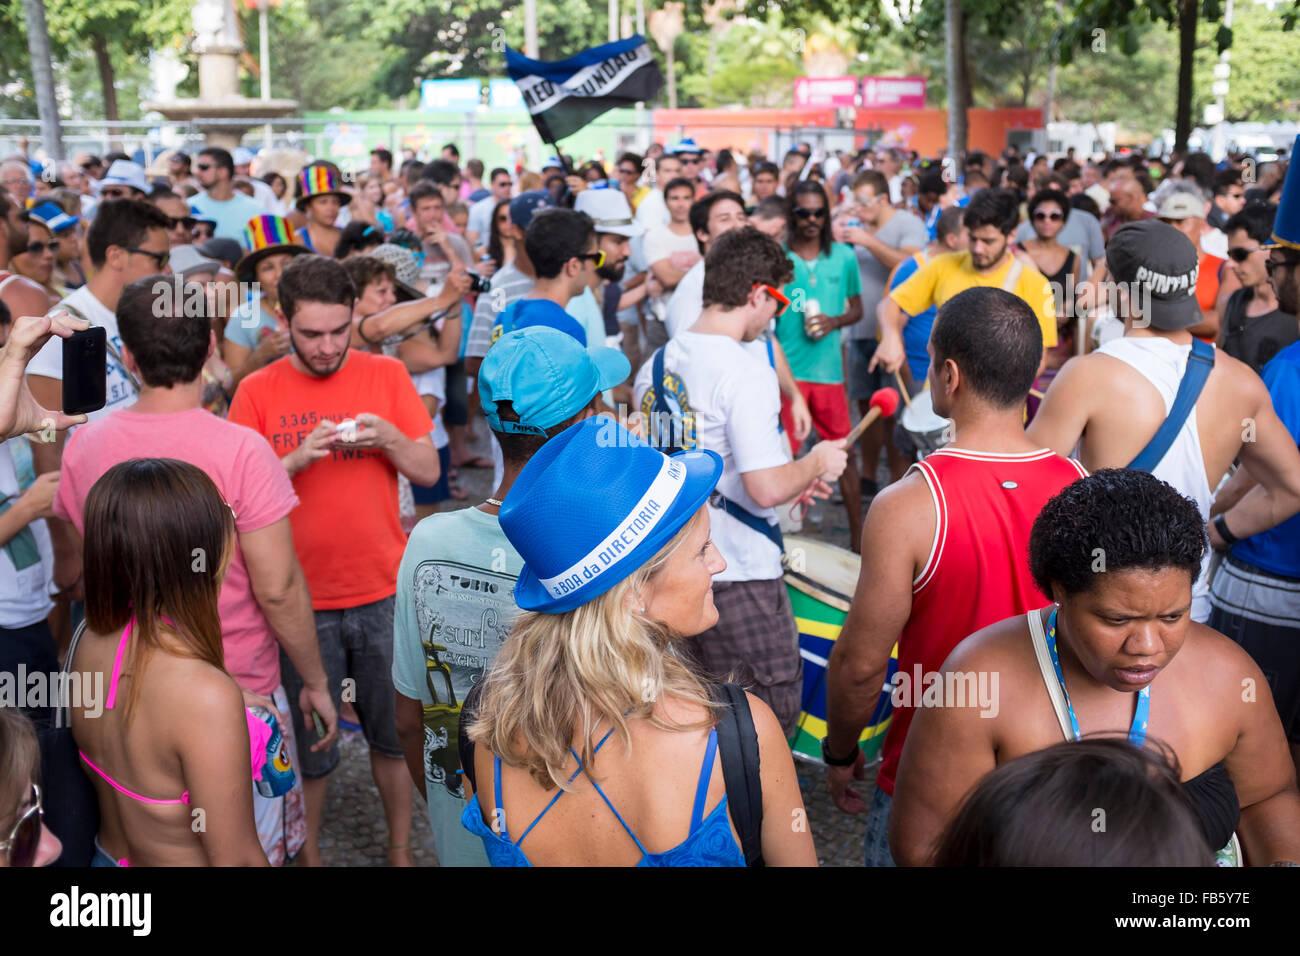 RIO DE JANEIRO, BRAZIL - FEBRUARY 28, 2014: Young Brazilians celebrate together at the Banda de Ipanema carnival Stock Photo